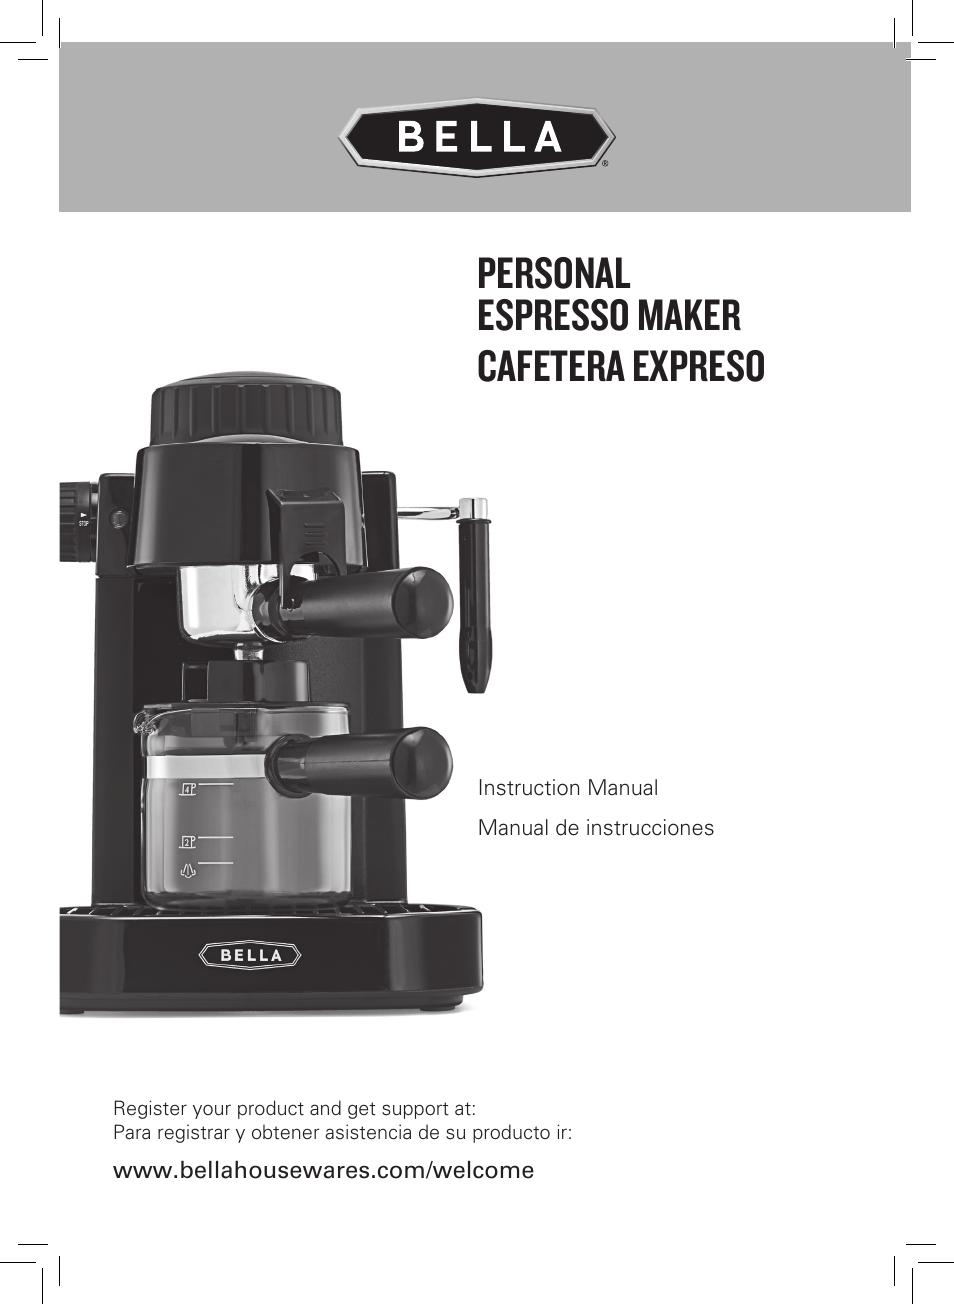 bella 13683 espresso maker user manual